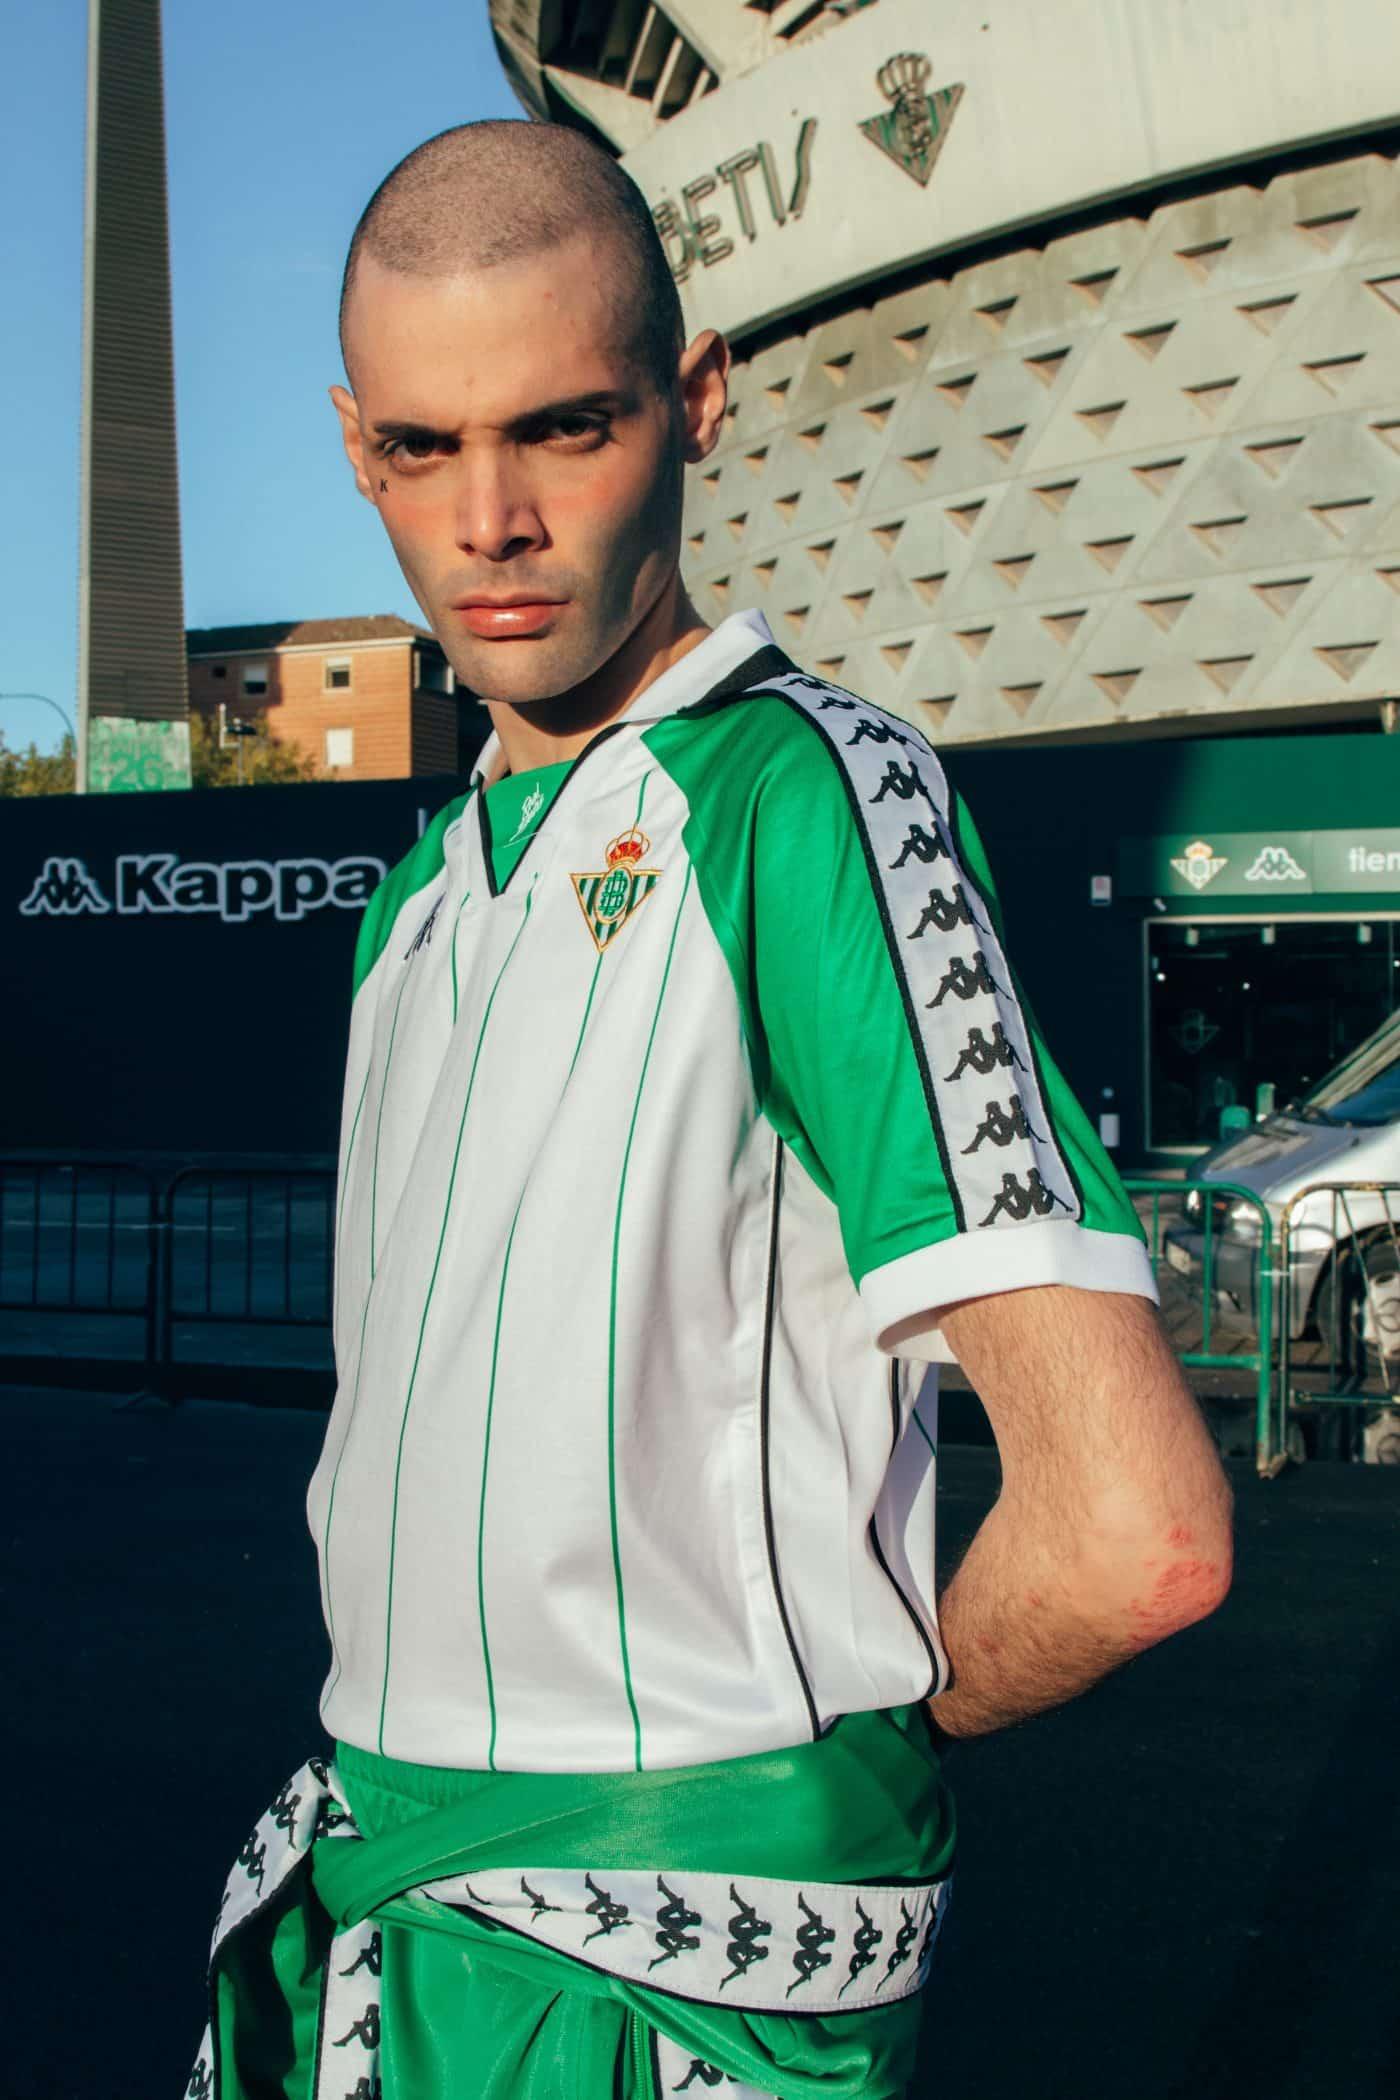 gamme-retro-soccer-kappa-betis-1-min